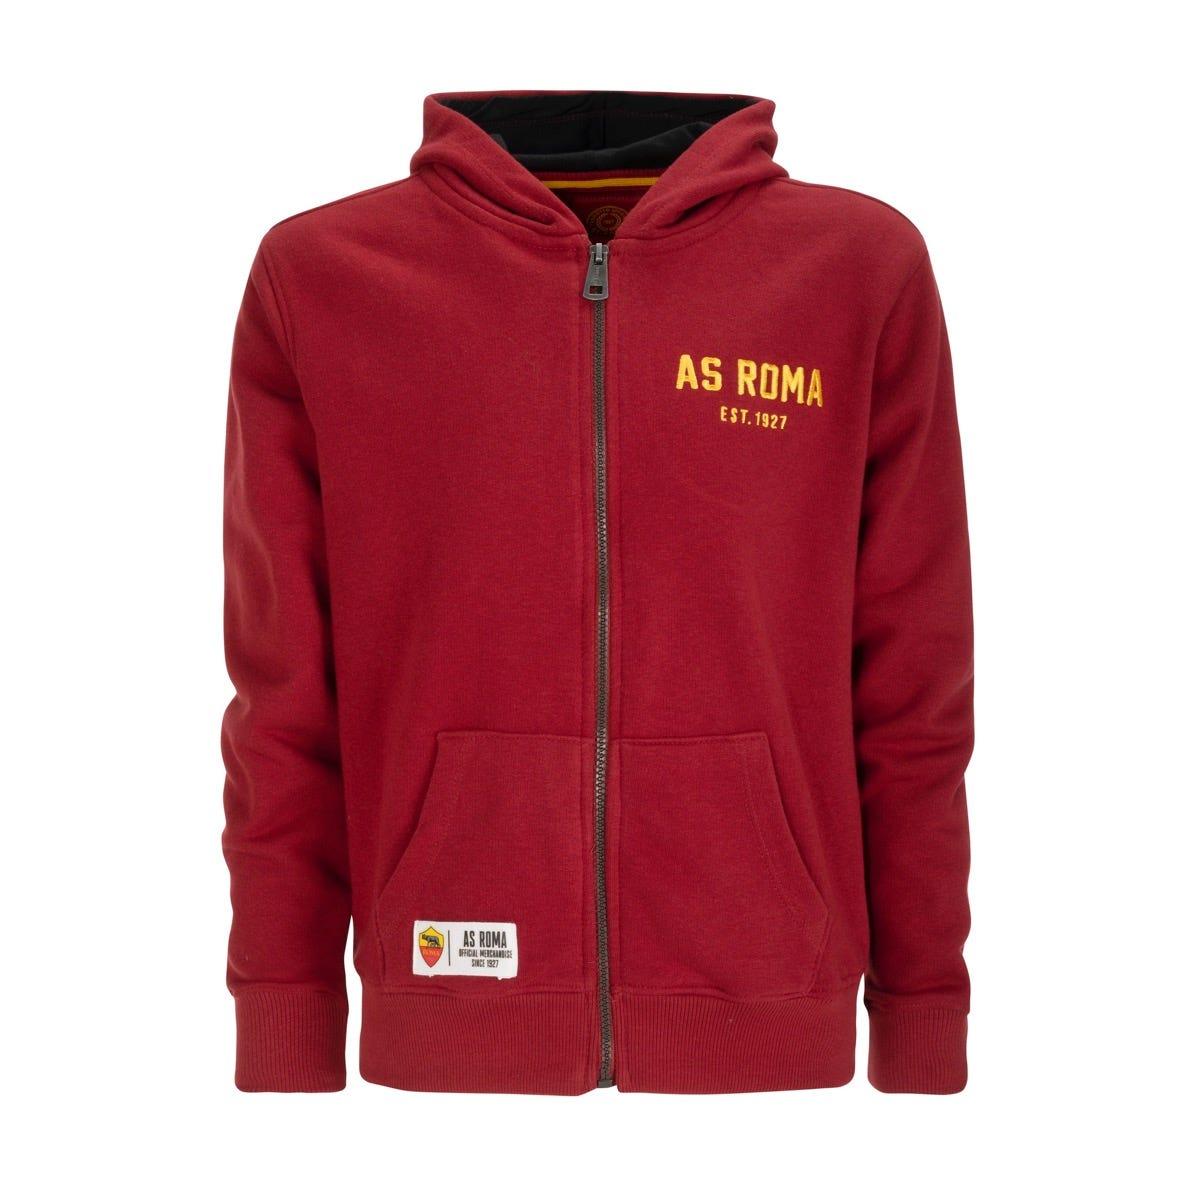 Felpe Bambini - Abbigliamento - AS Roma Store